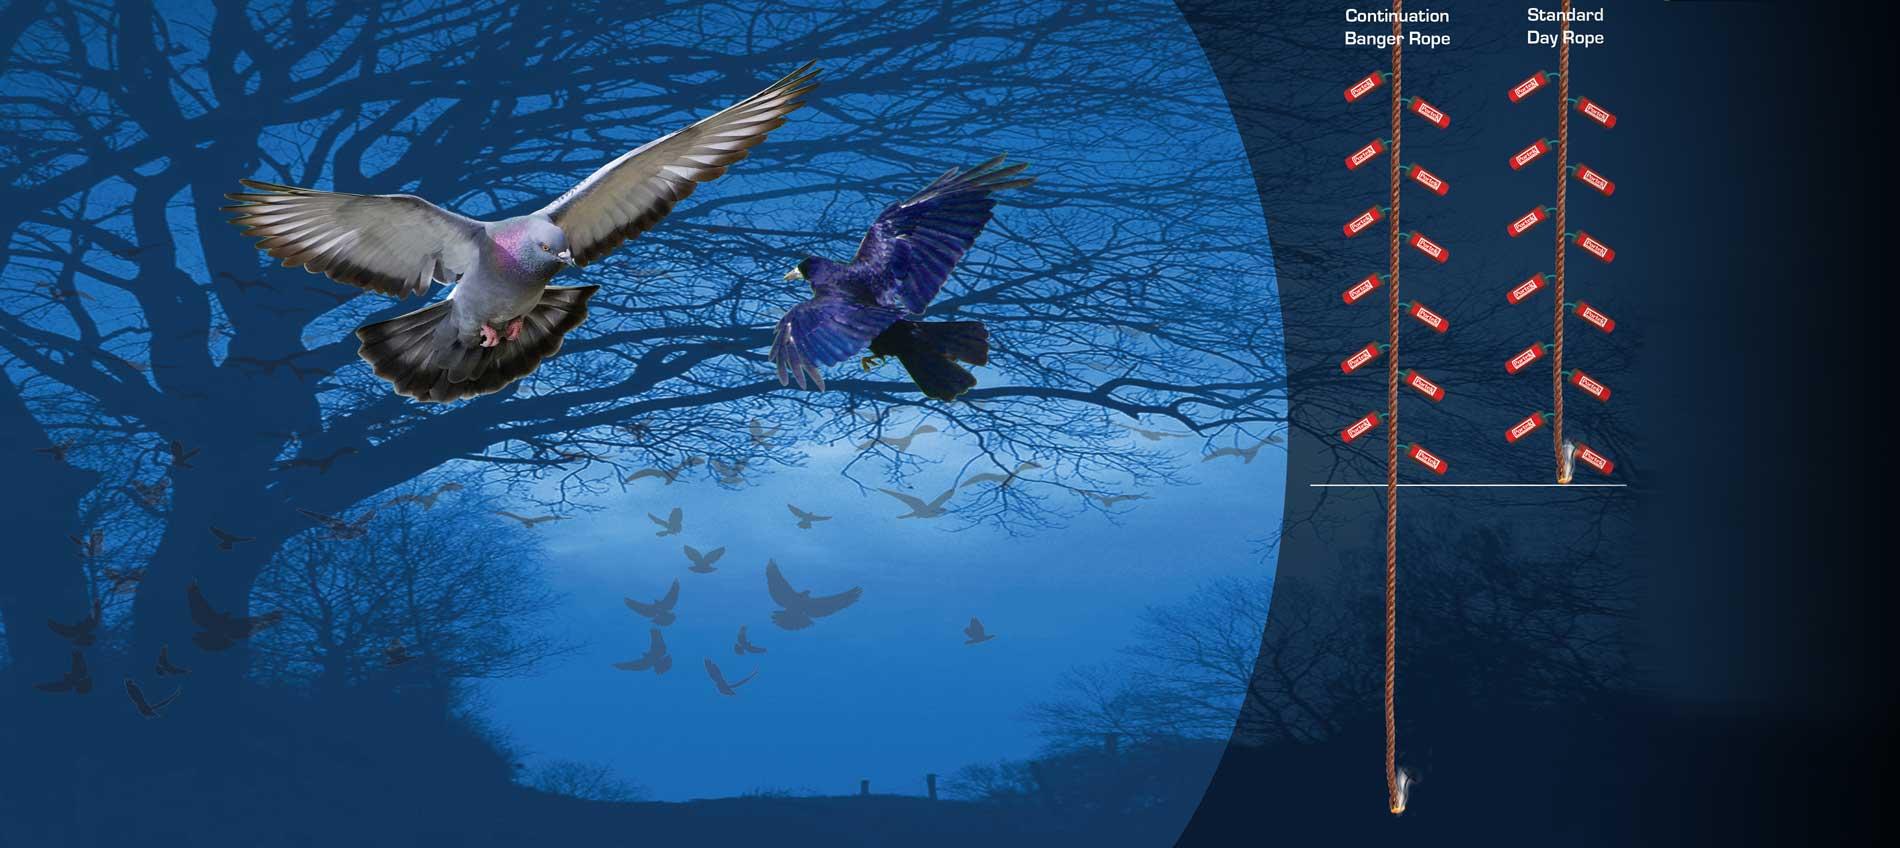 portek nighttime banger rope bird deterrent crop defence